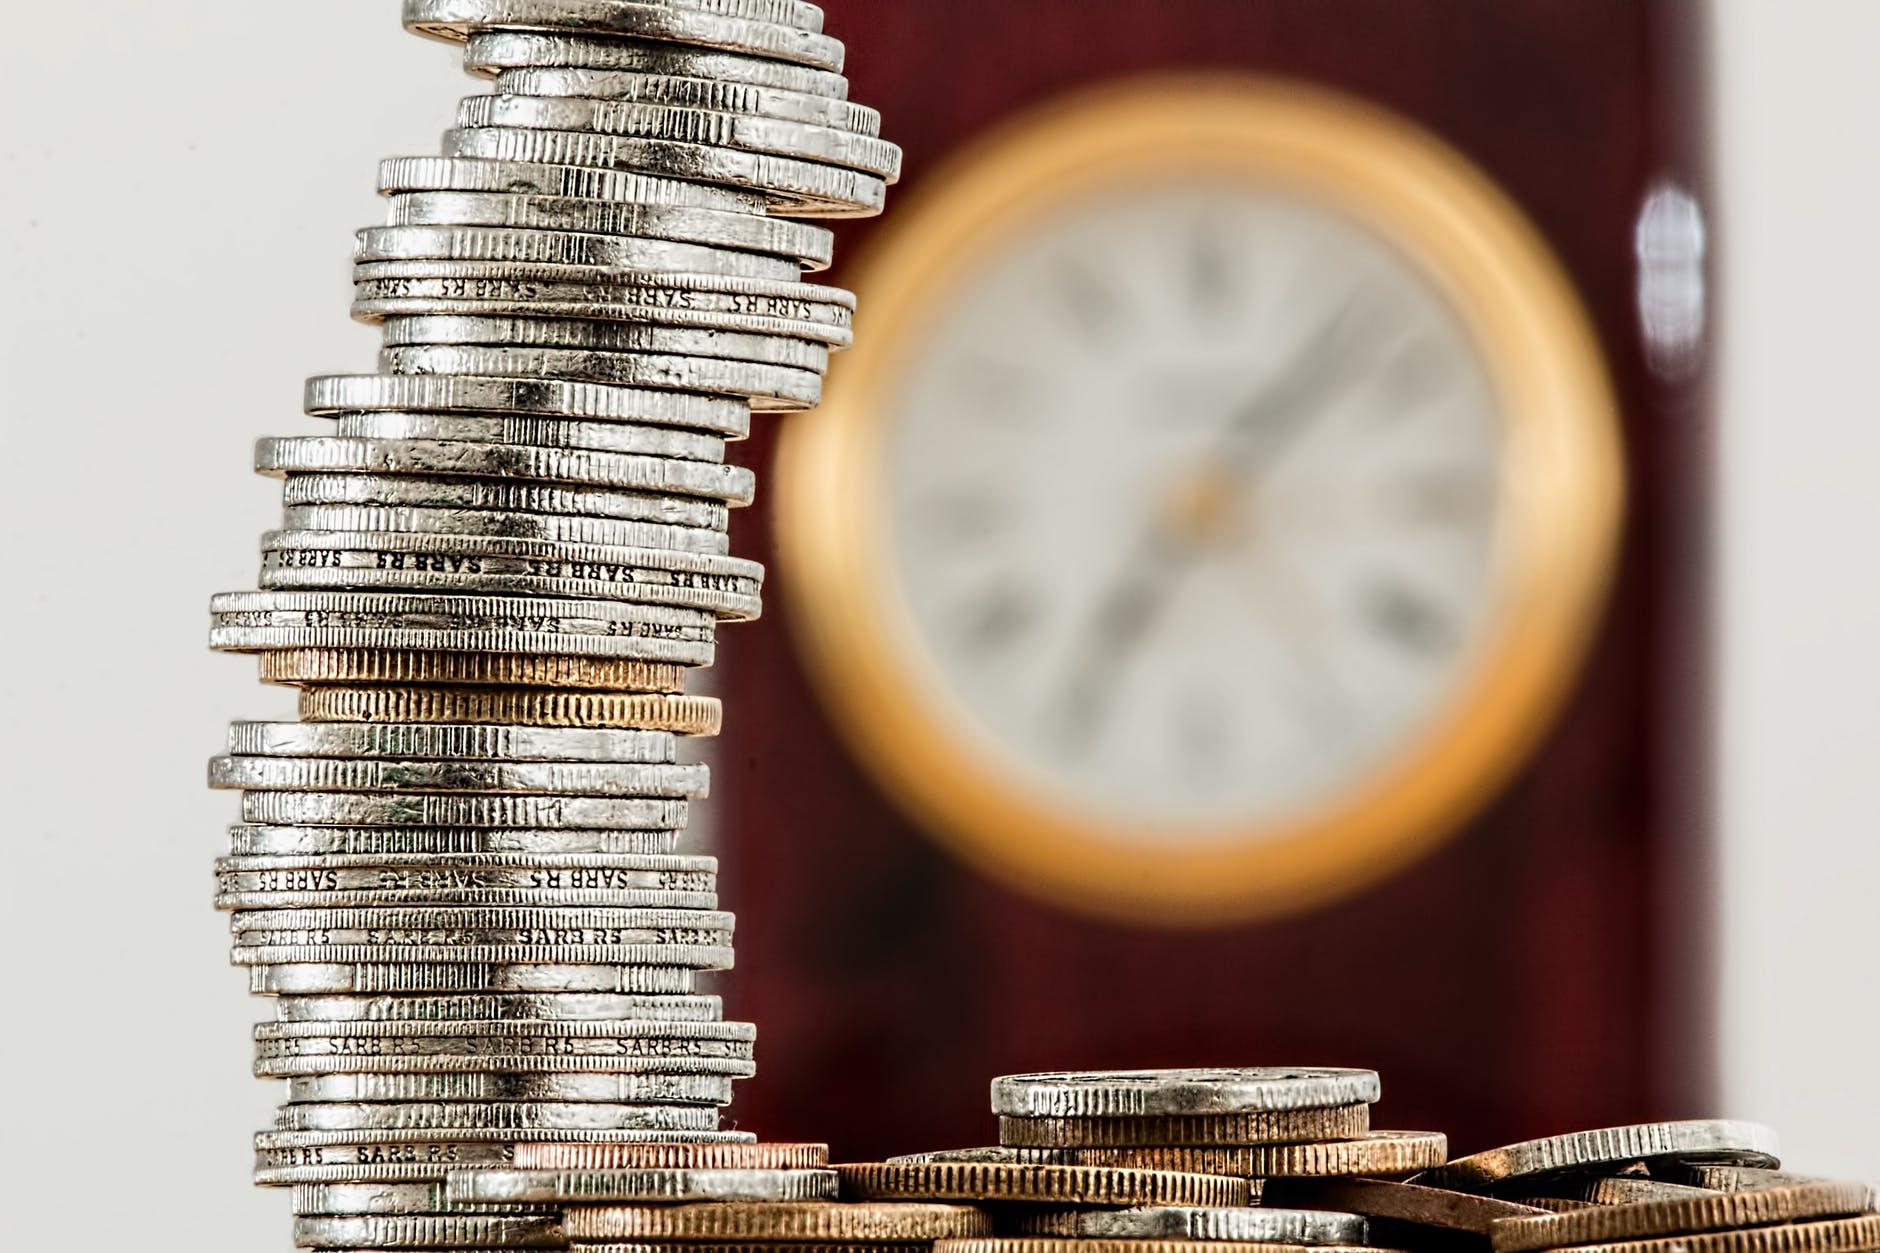 https://ekaenlinea.com/wp-content/uploads/2018/07/coins-currency-investment-insurance-128867.jpeg